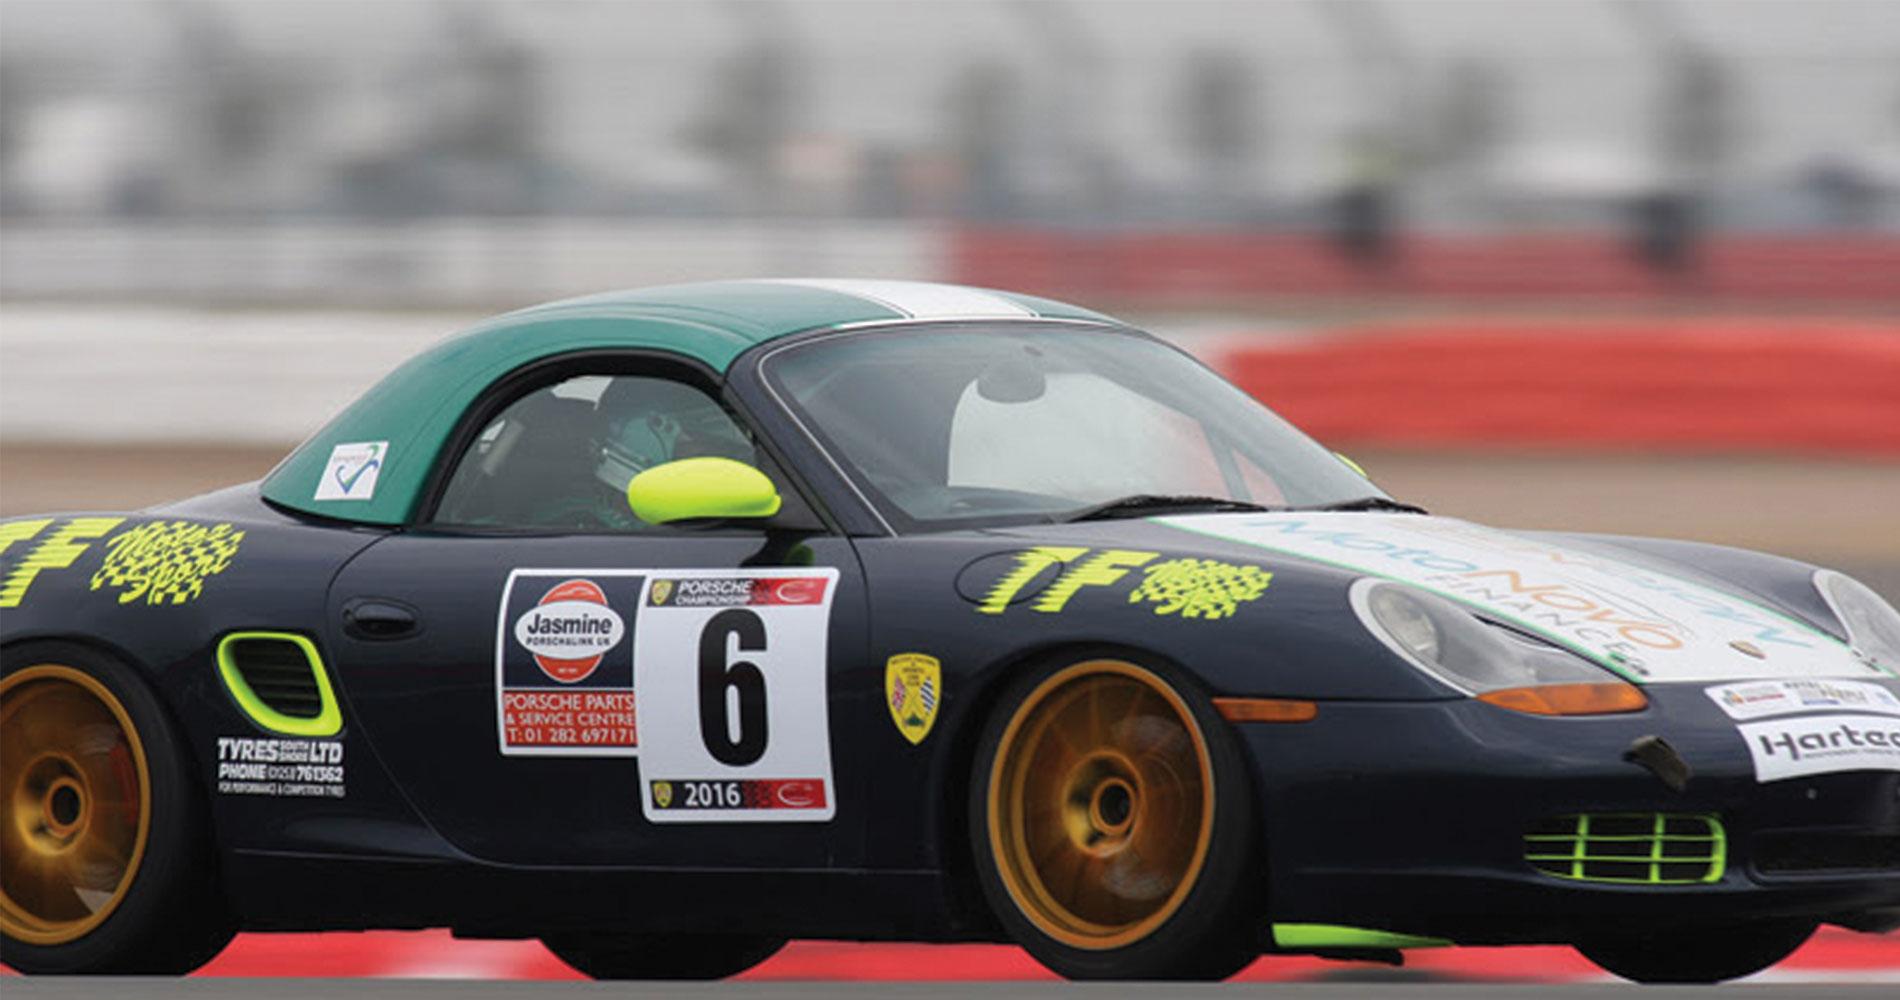 toyo-brscc-porsche-championship-race-report-motorsportdays-track-days-1